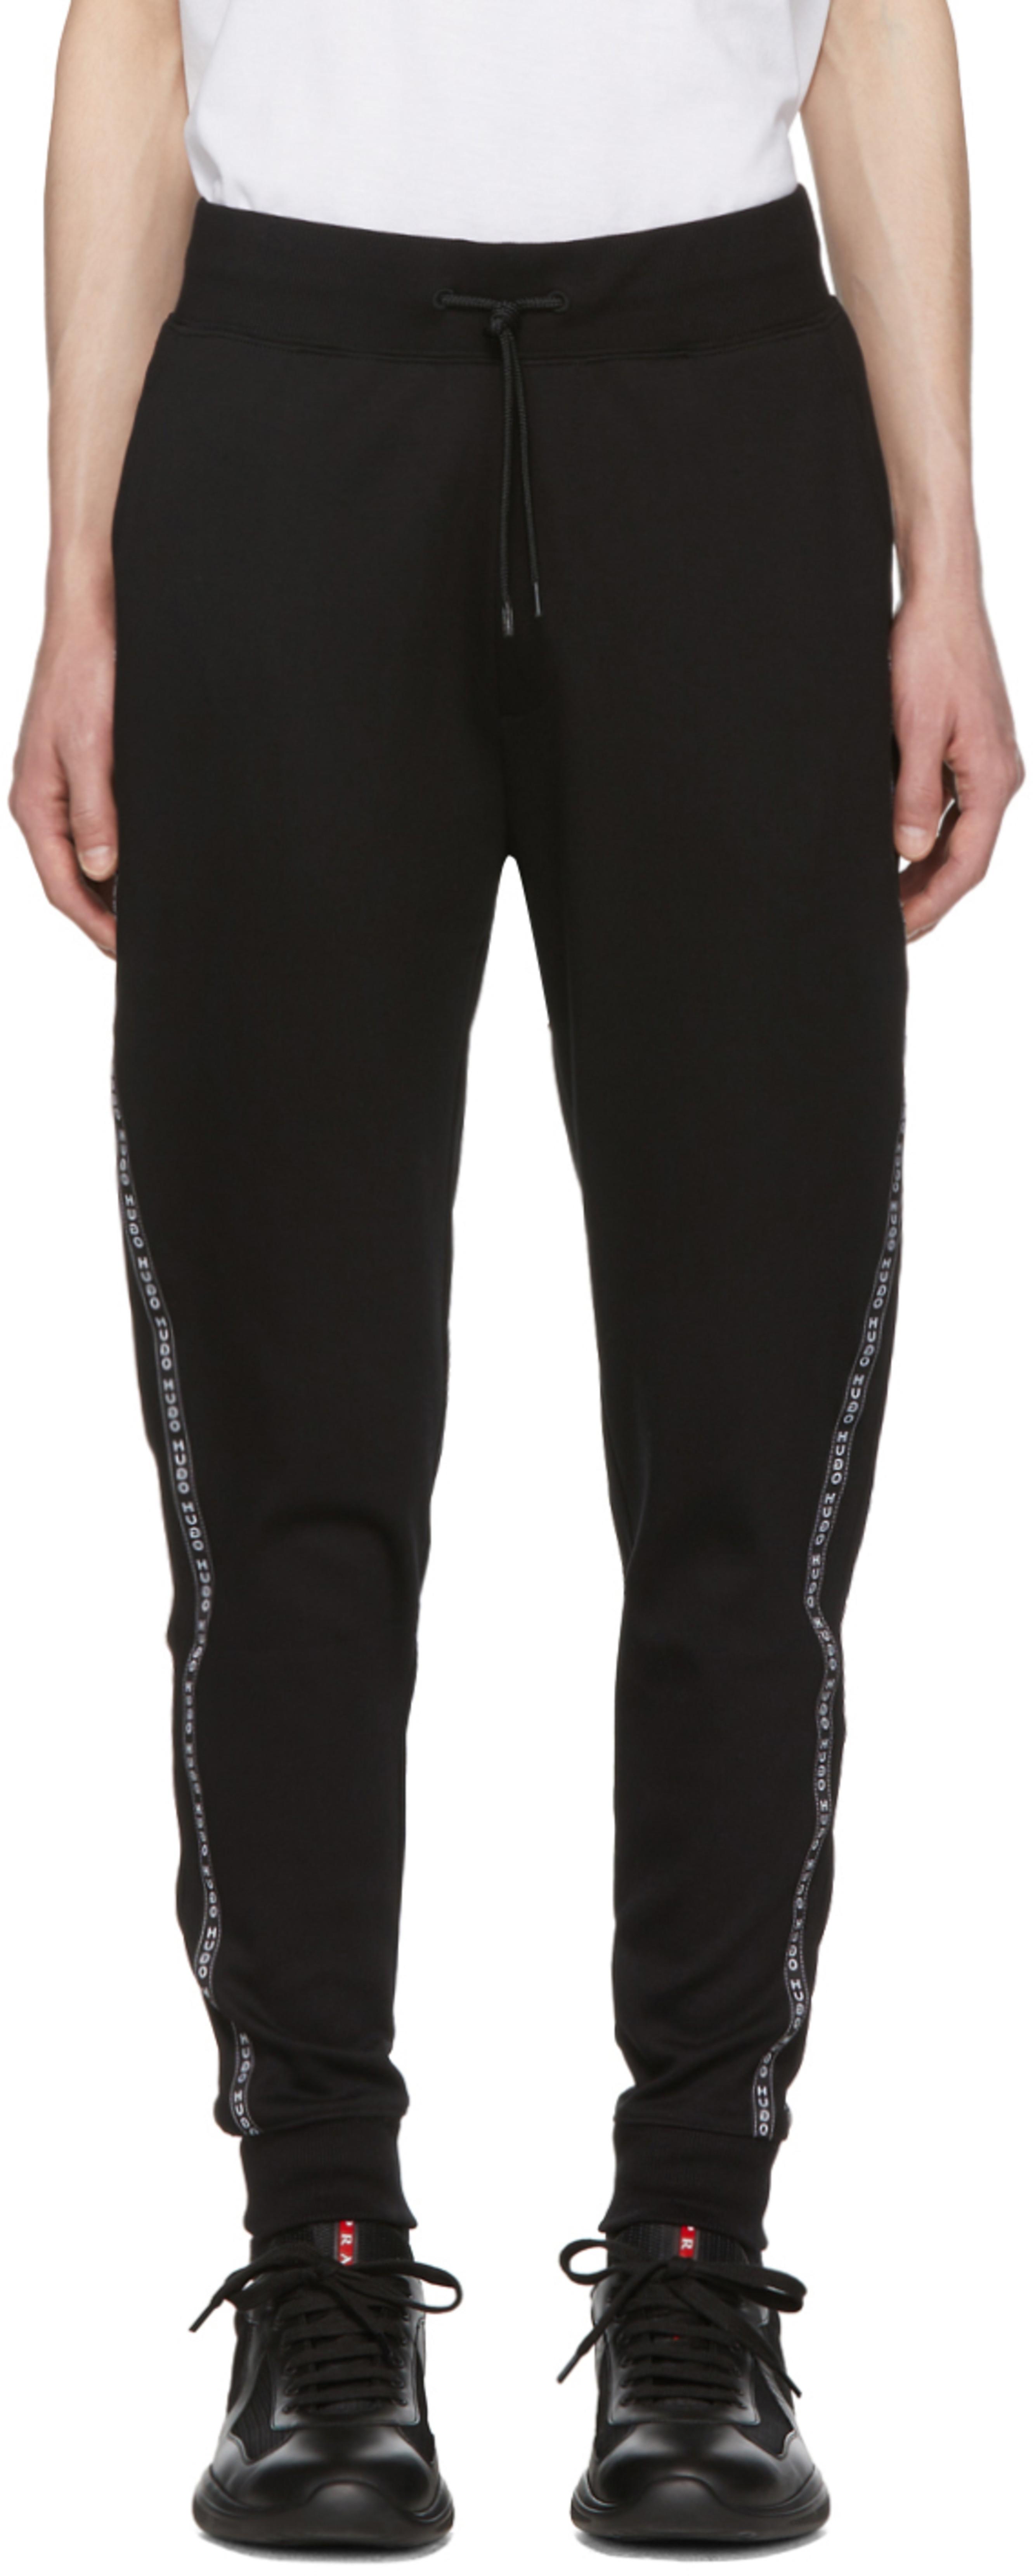 8610d2e3c Designer sweatpants for Men